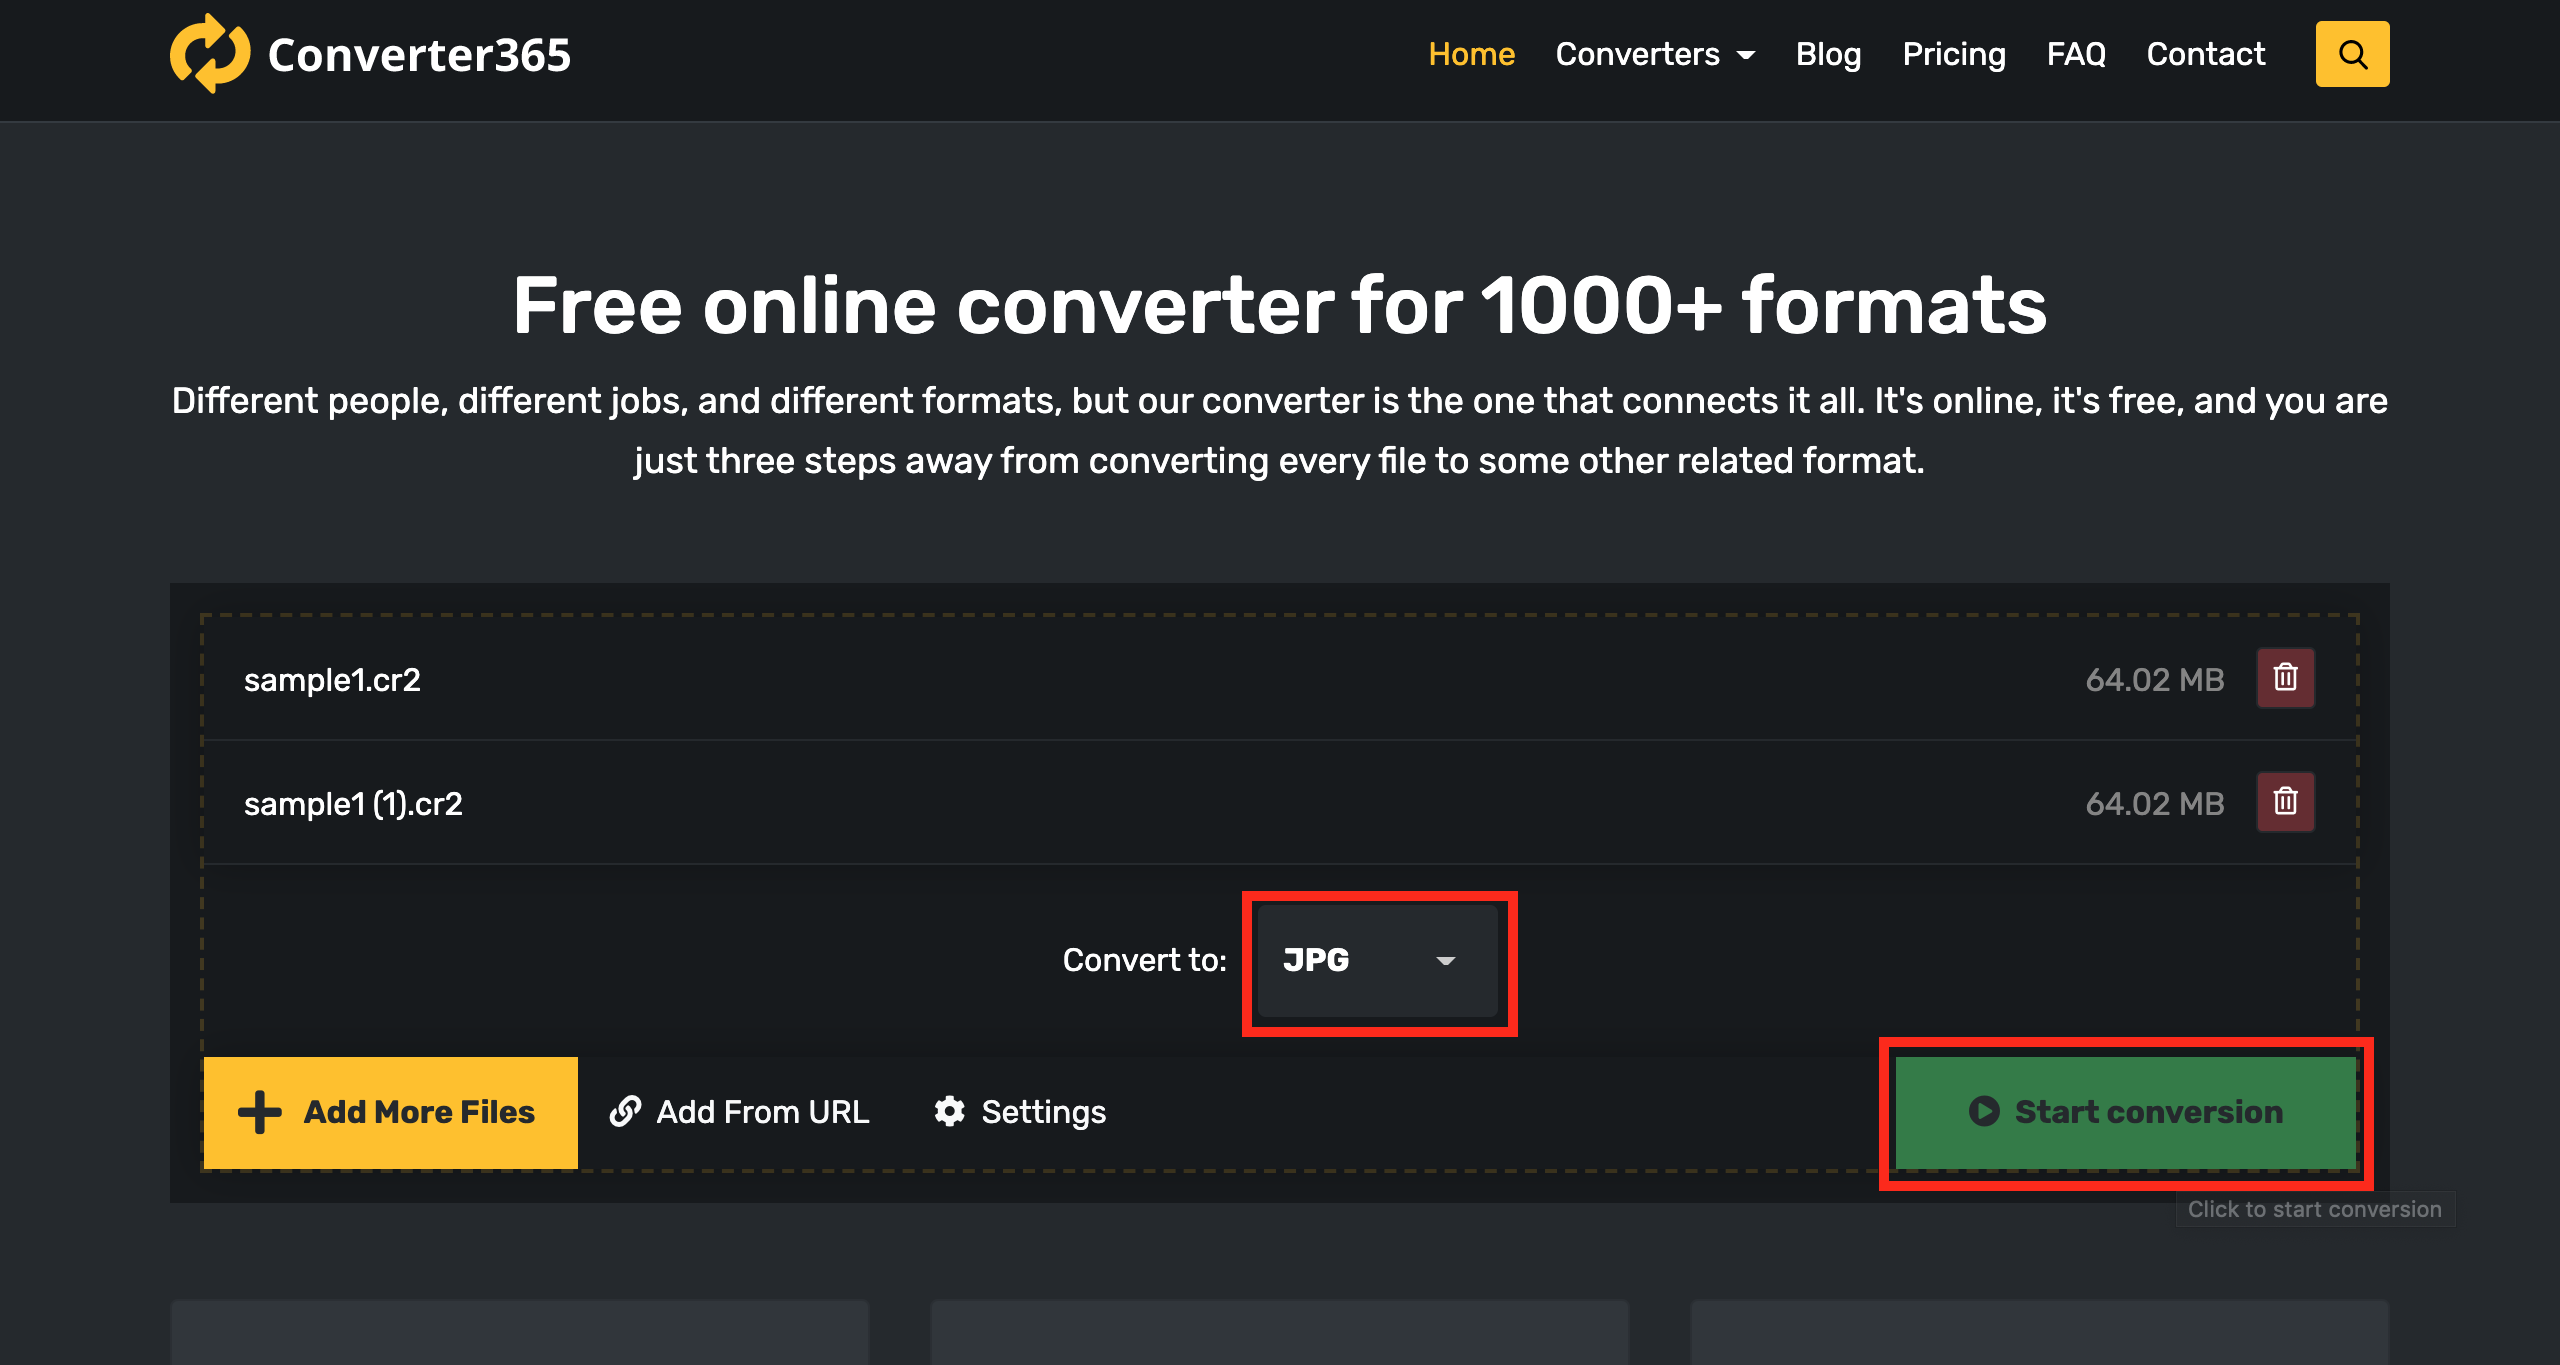 convert CR2 to JPG using Converter365 - Step 2